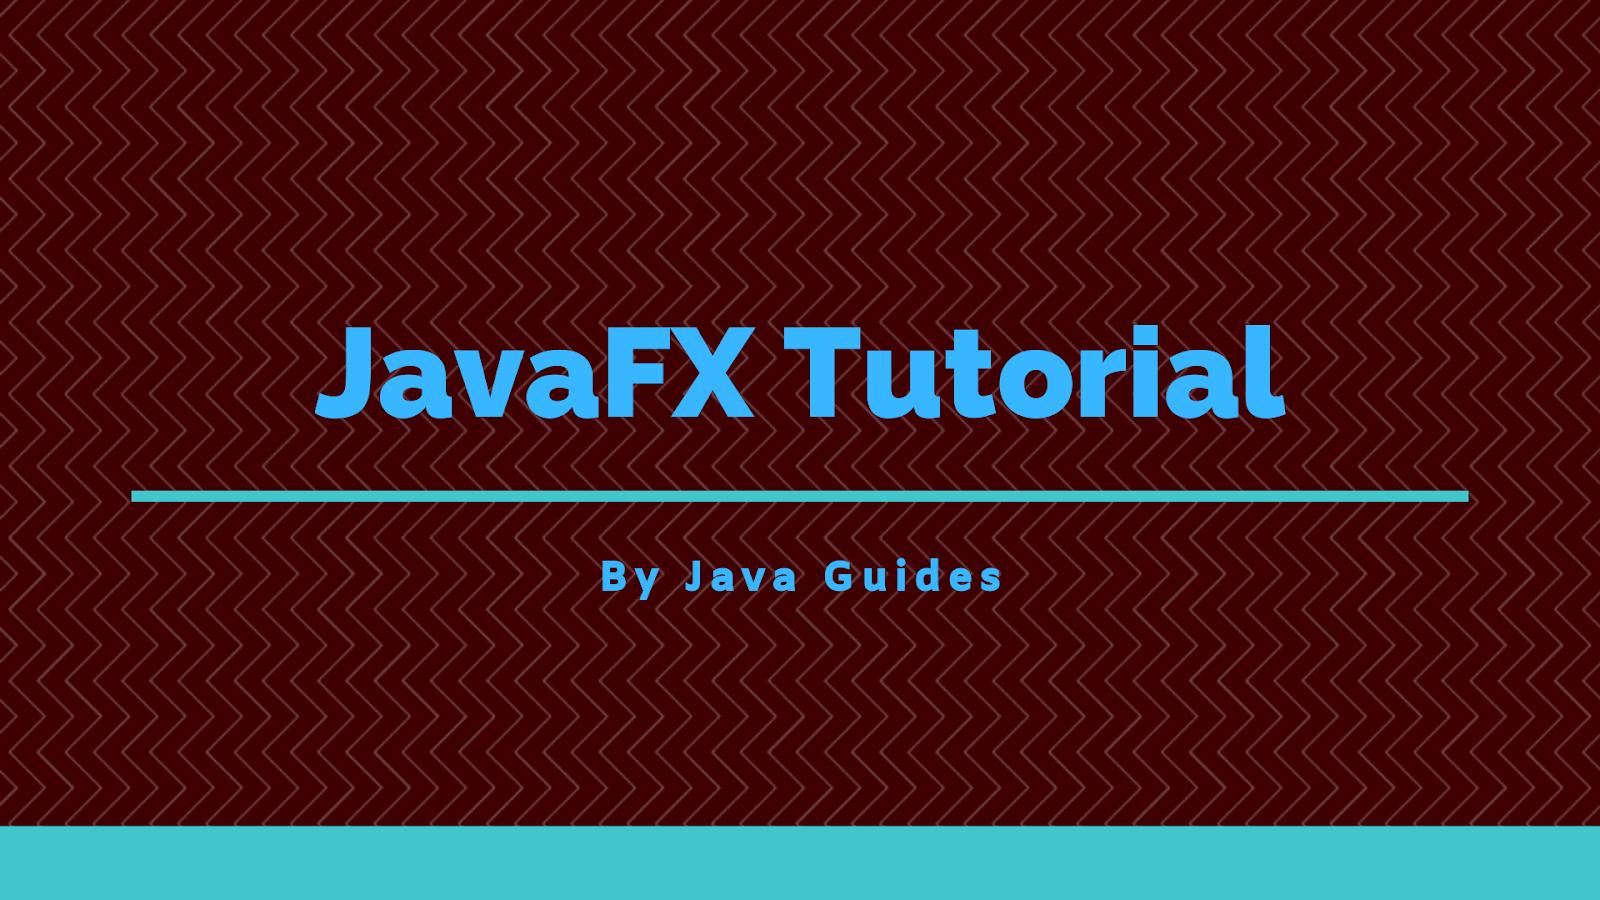 JavaFX Tutorial